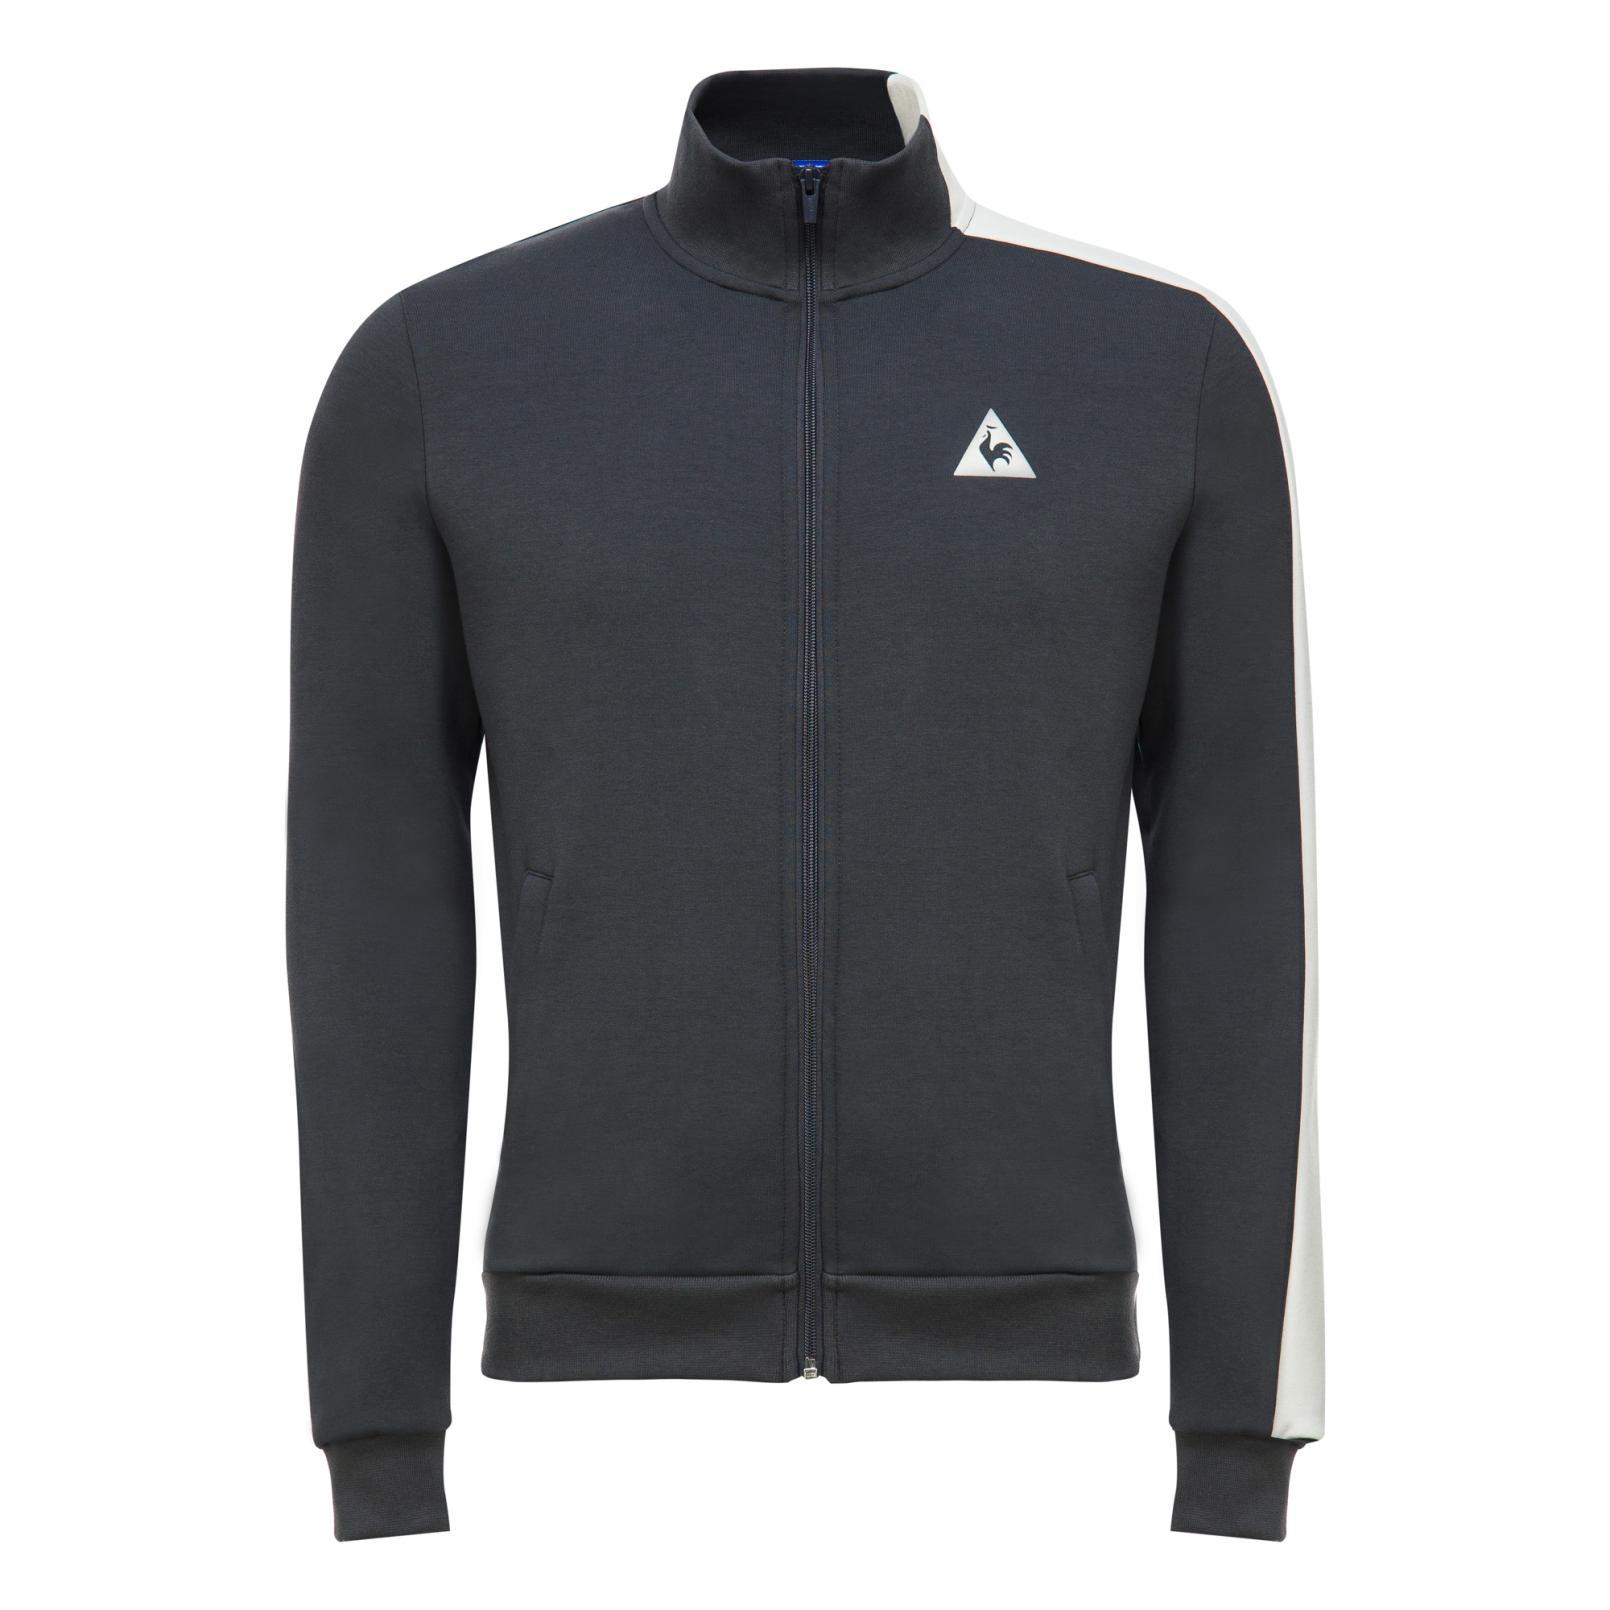 Sweat tops – Le Coq Sportif Full Zip Sweatsthirt Essentiels Multicolored